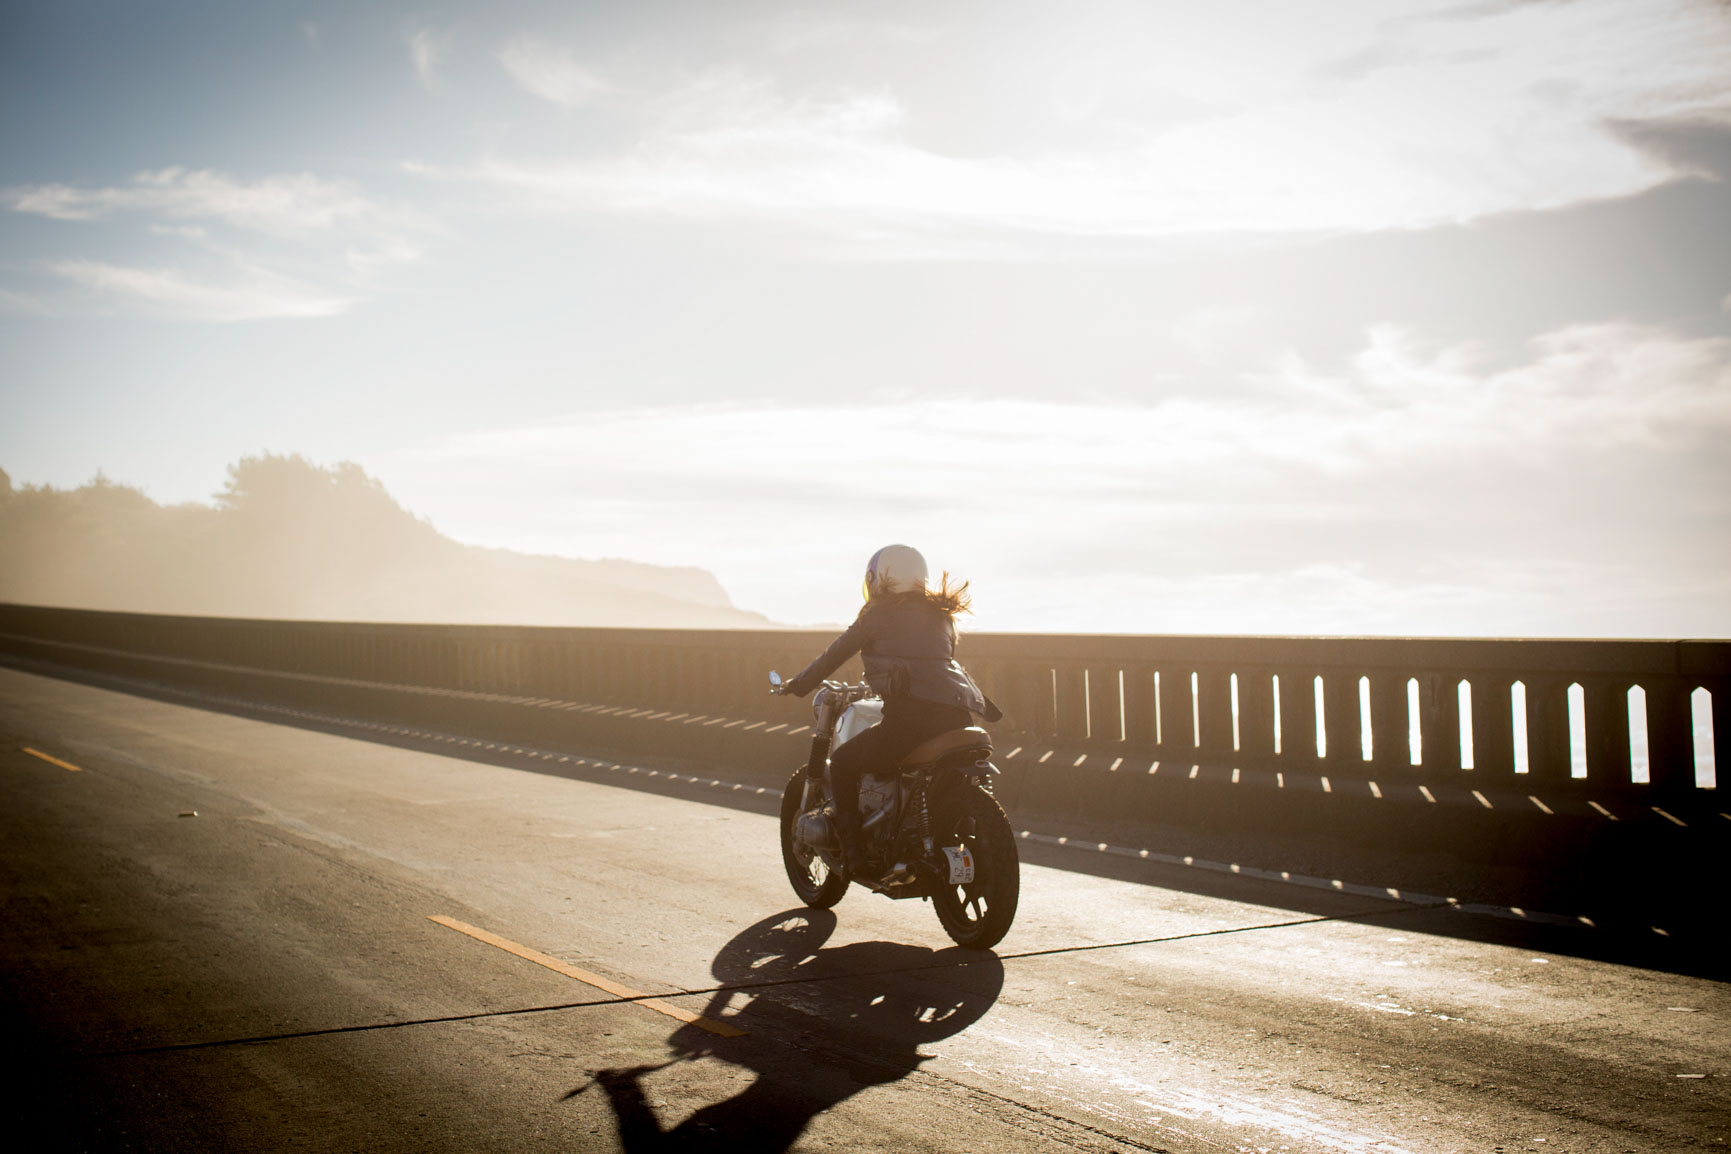 TN - National University - 2017.10.24 - 02564 - Motorcycle.jpg